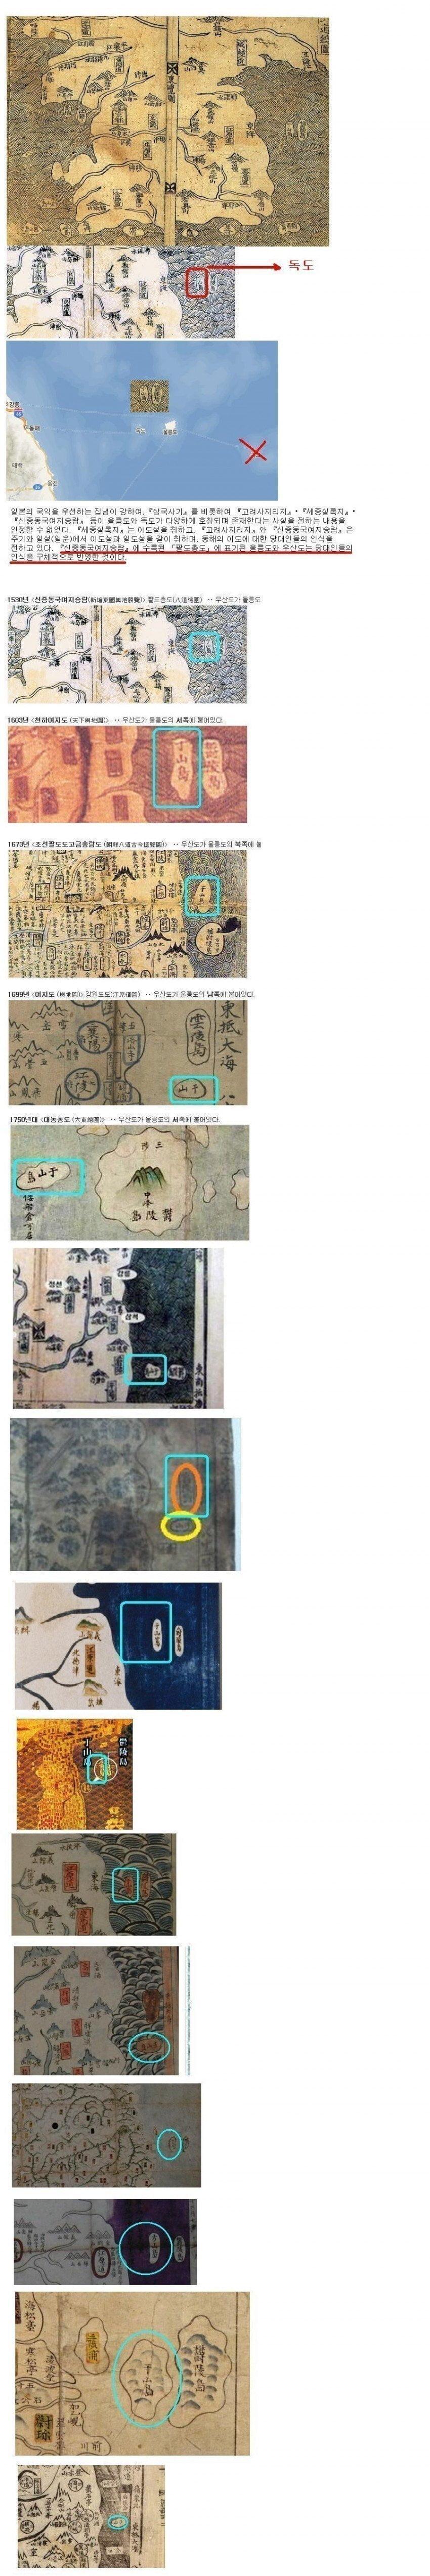 viewimage.php?id=25b8dc2aeedd2aa36f&no=24b0d769e1d32ca73ceb86fa11d02831eebc6c37c2fa034916fac403202405e2dd01ef055fa239274608139ad97bf74ac9b9f05565c9adce6fa2650566c765ccf14a910ba1ce89bd85a9dc